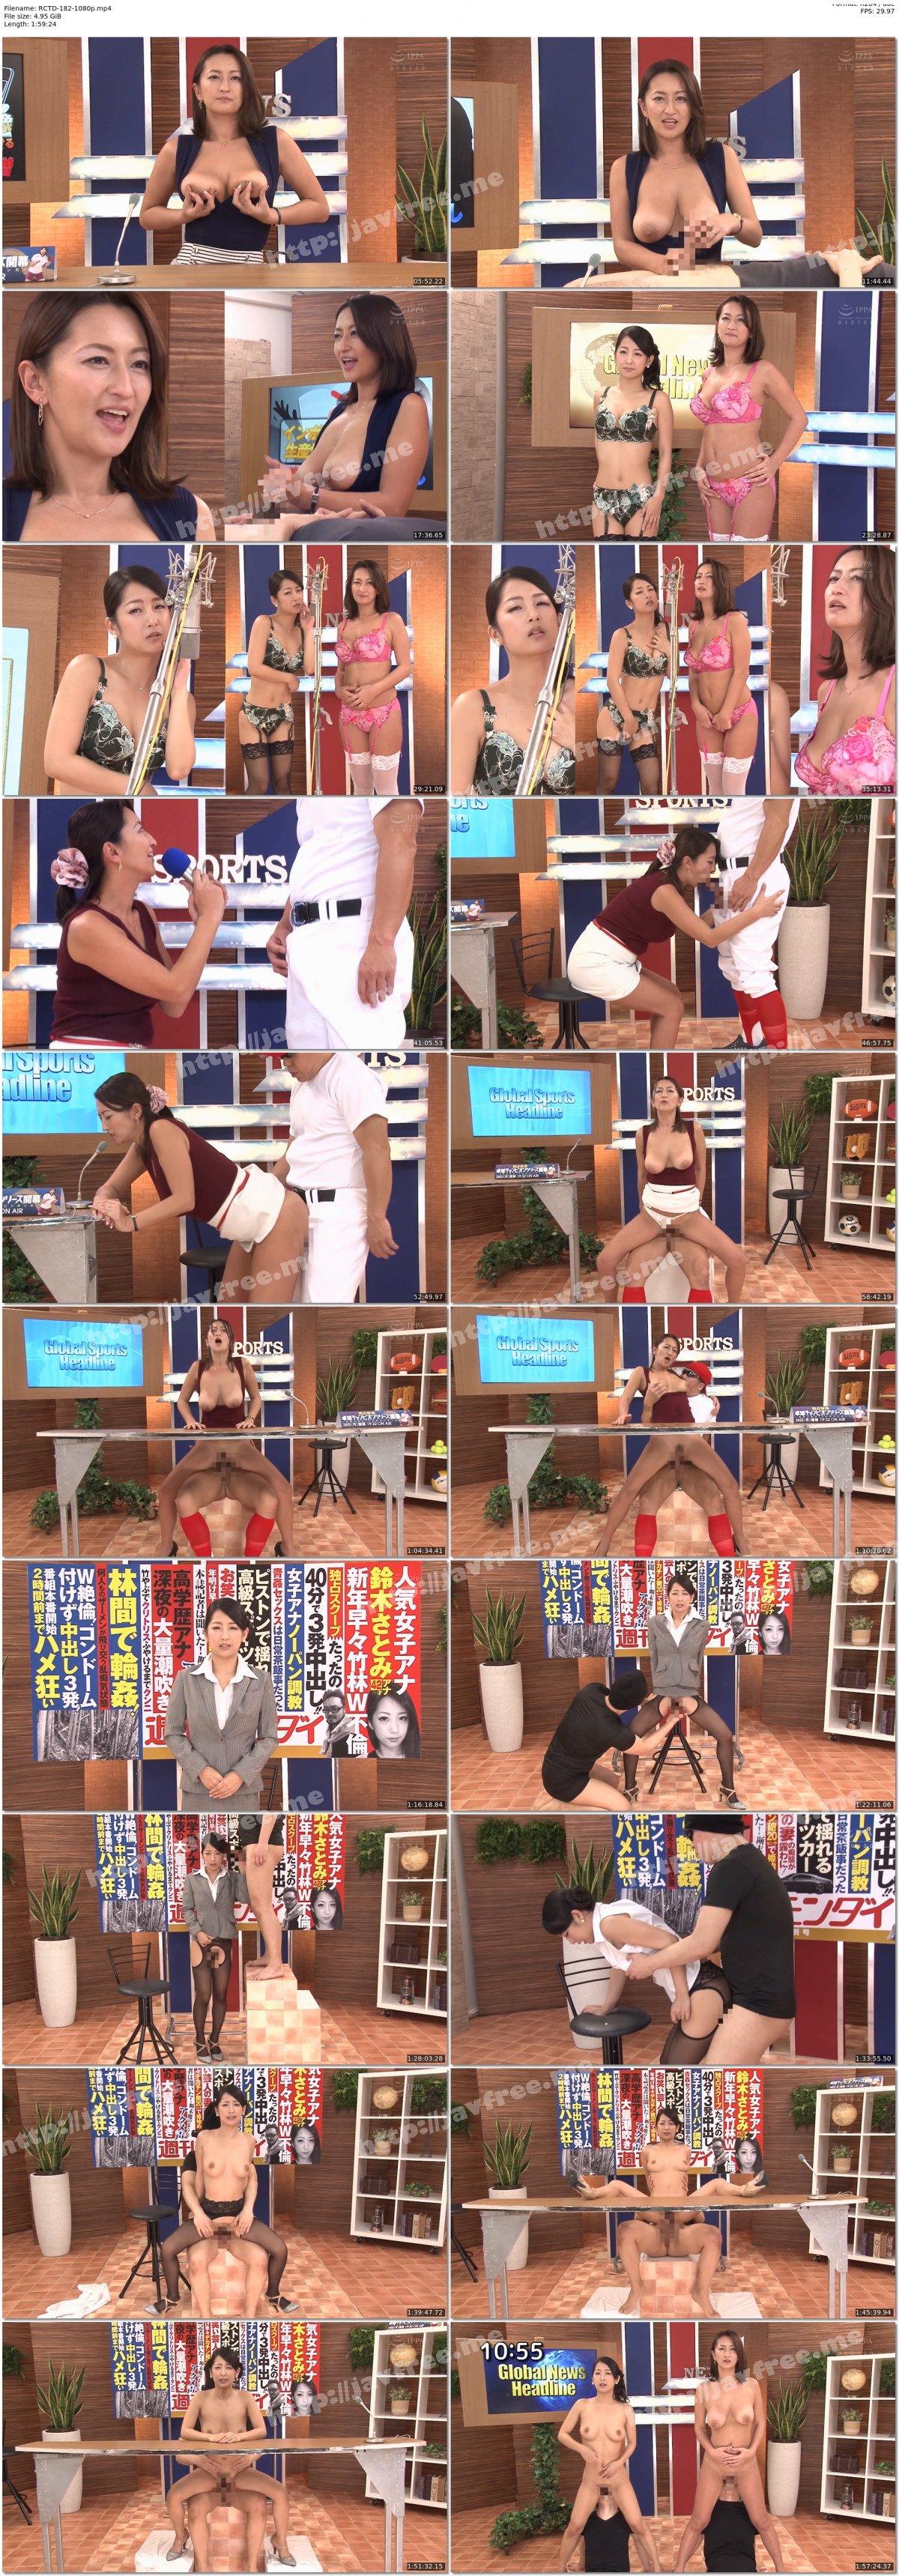 [HD][RCTD-182] 淫語女子アナ16 ズバリSEXしたい人妻アナSP - image RCTD-182-1080p on https://javfree.me